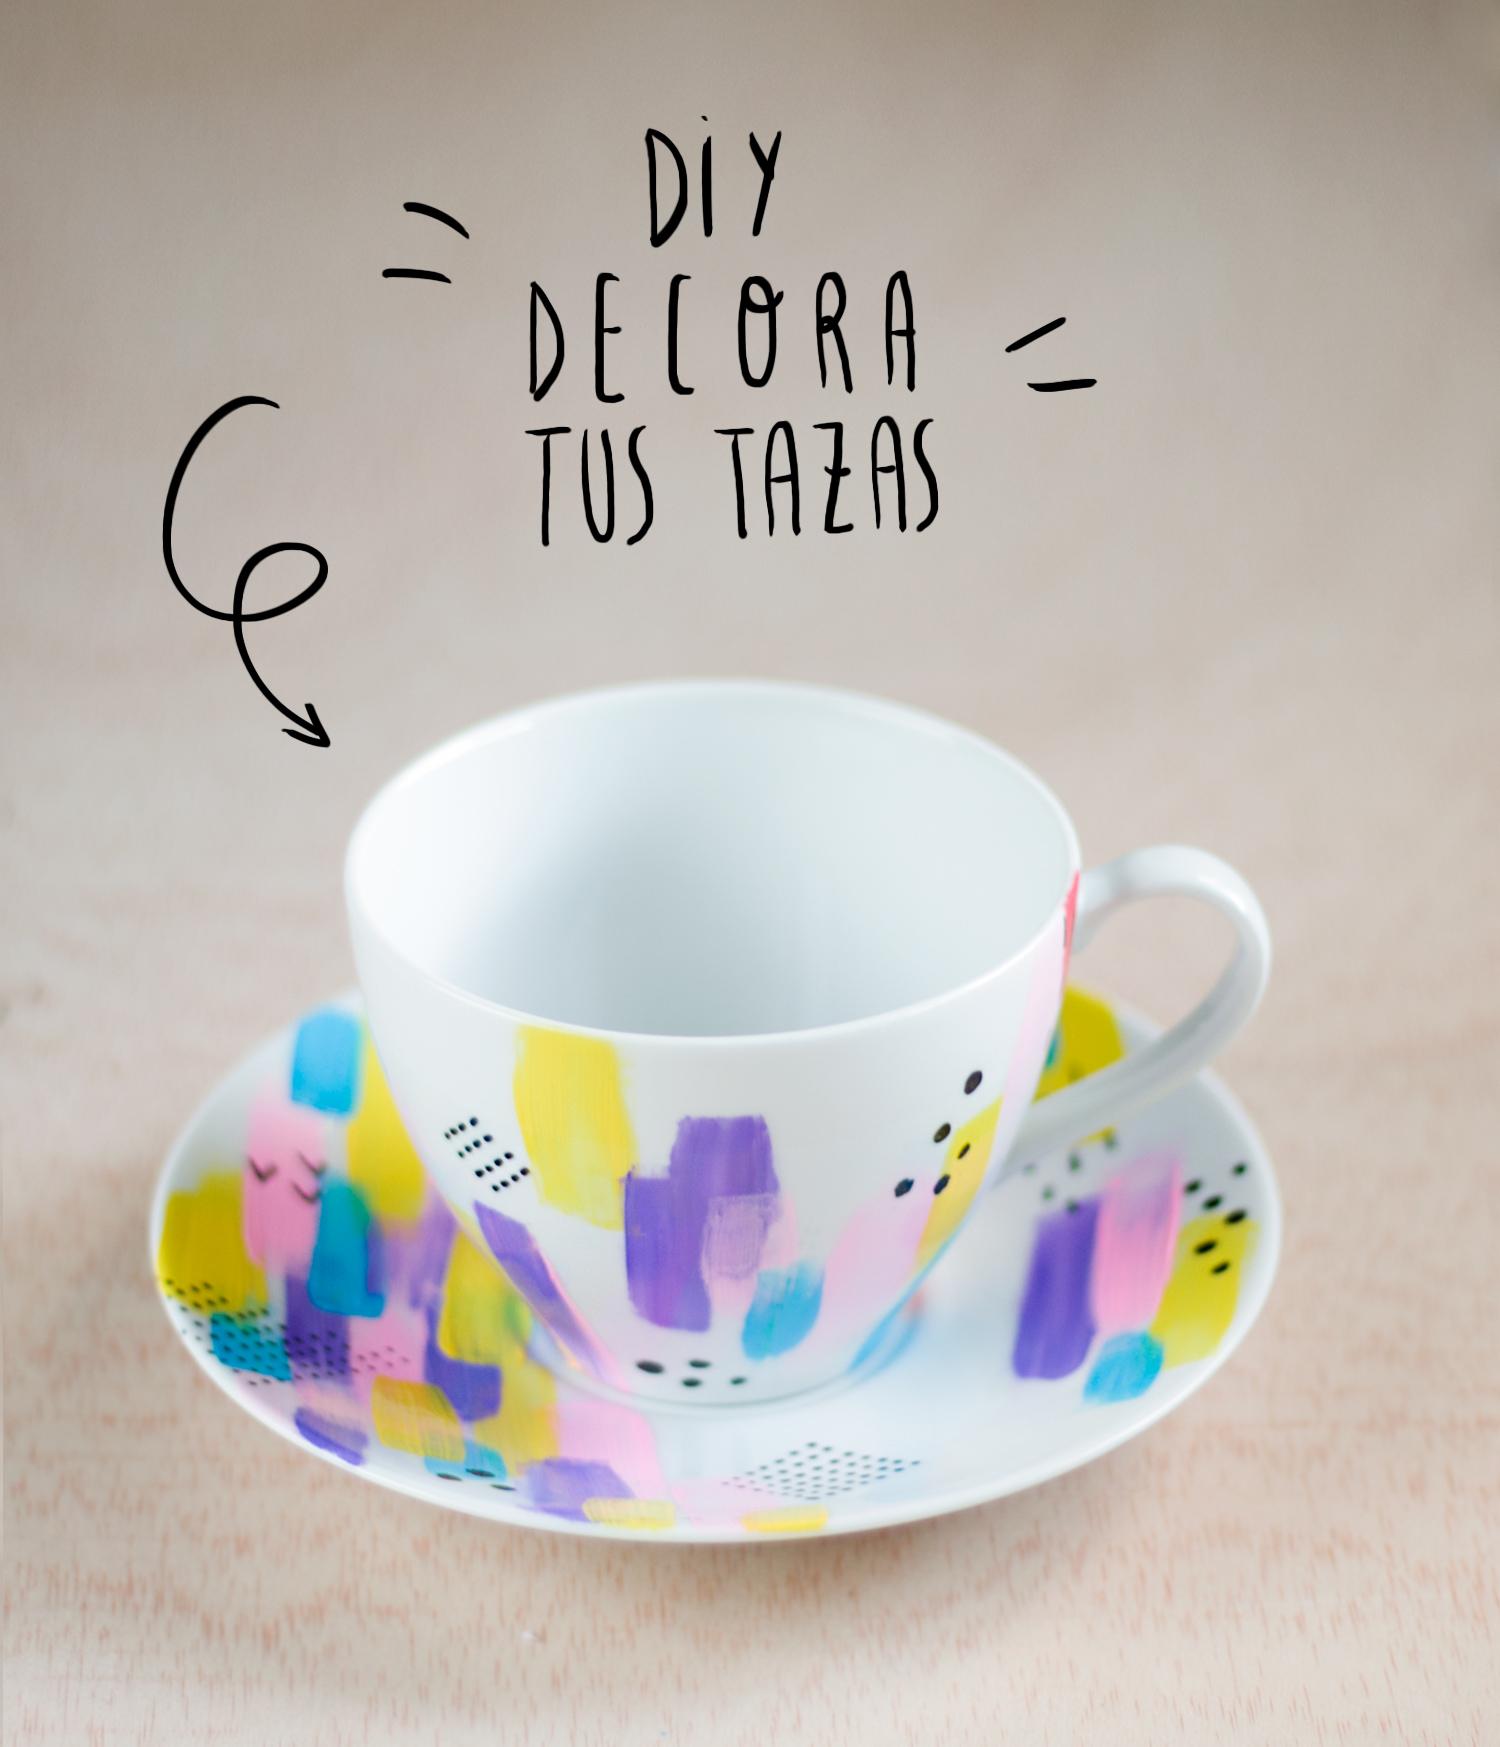 DIY decora tus tazas